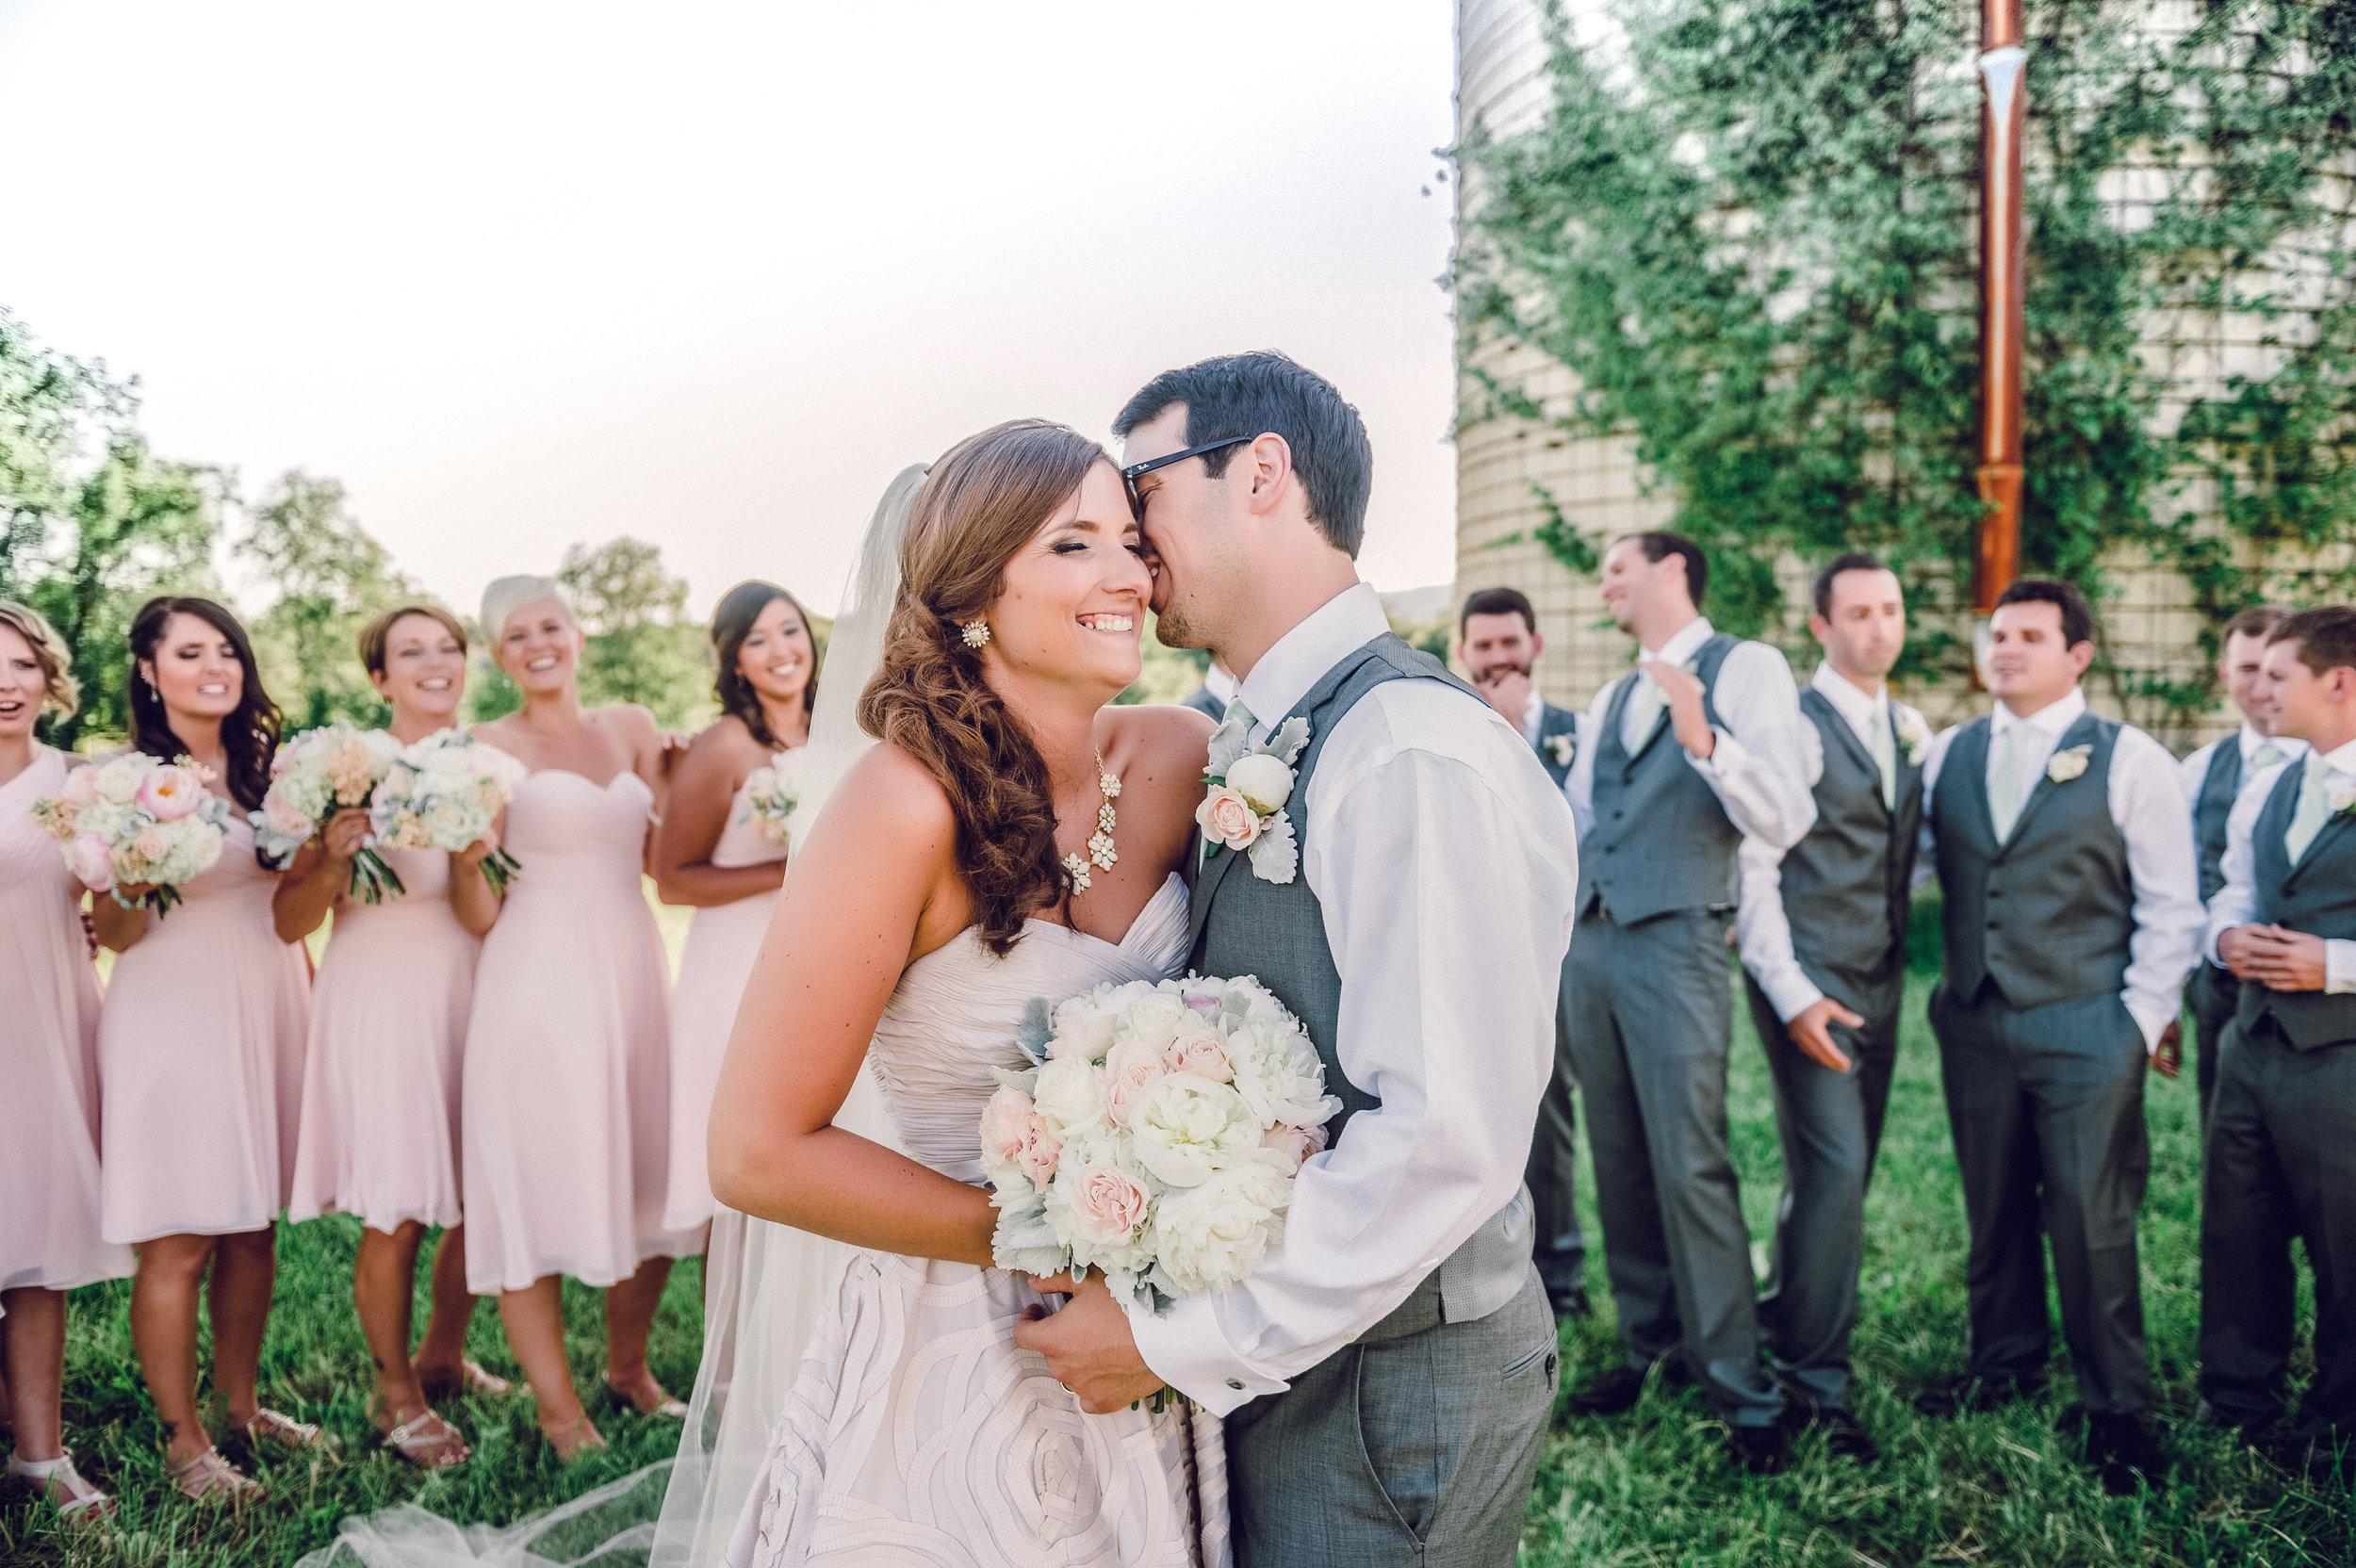 Silverbrook-Farm-Weddings-Virginia-31.jpg